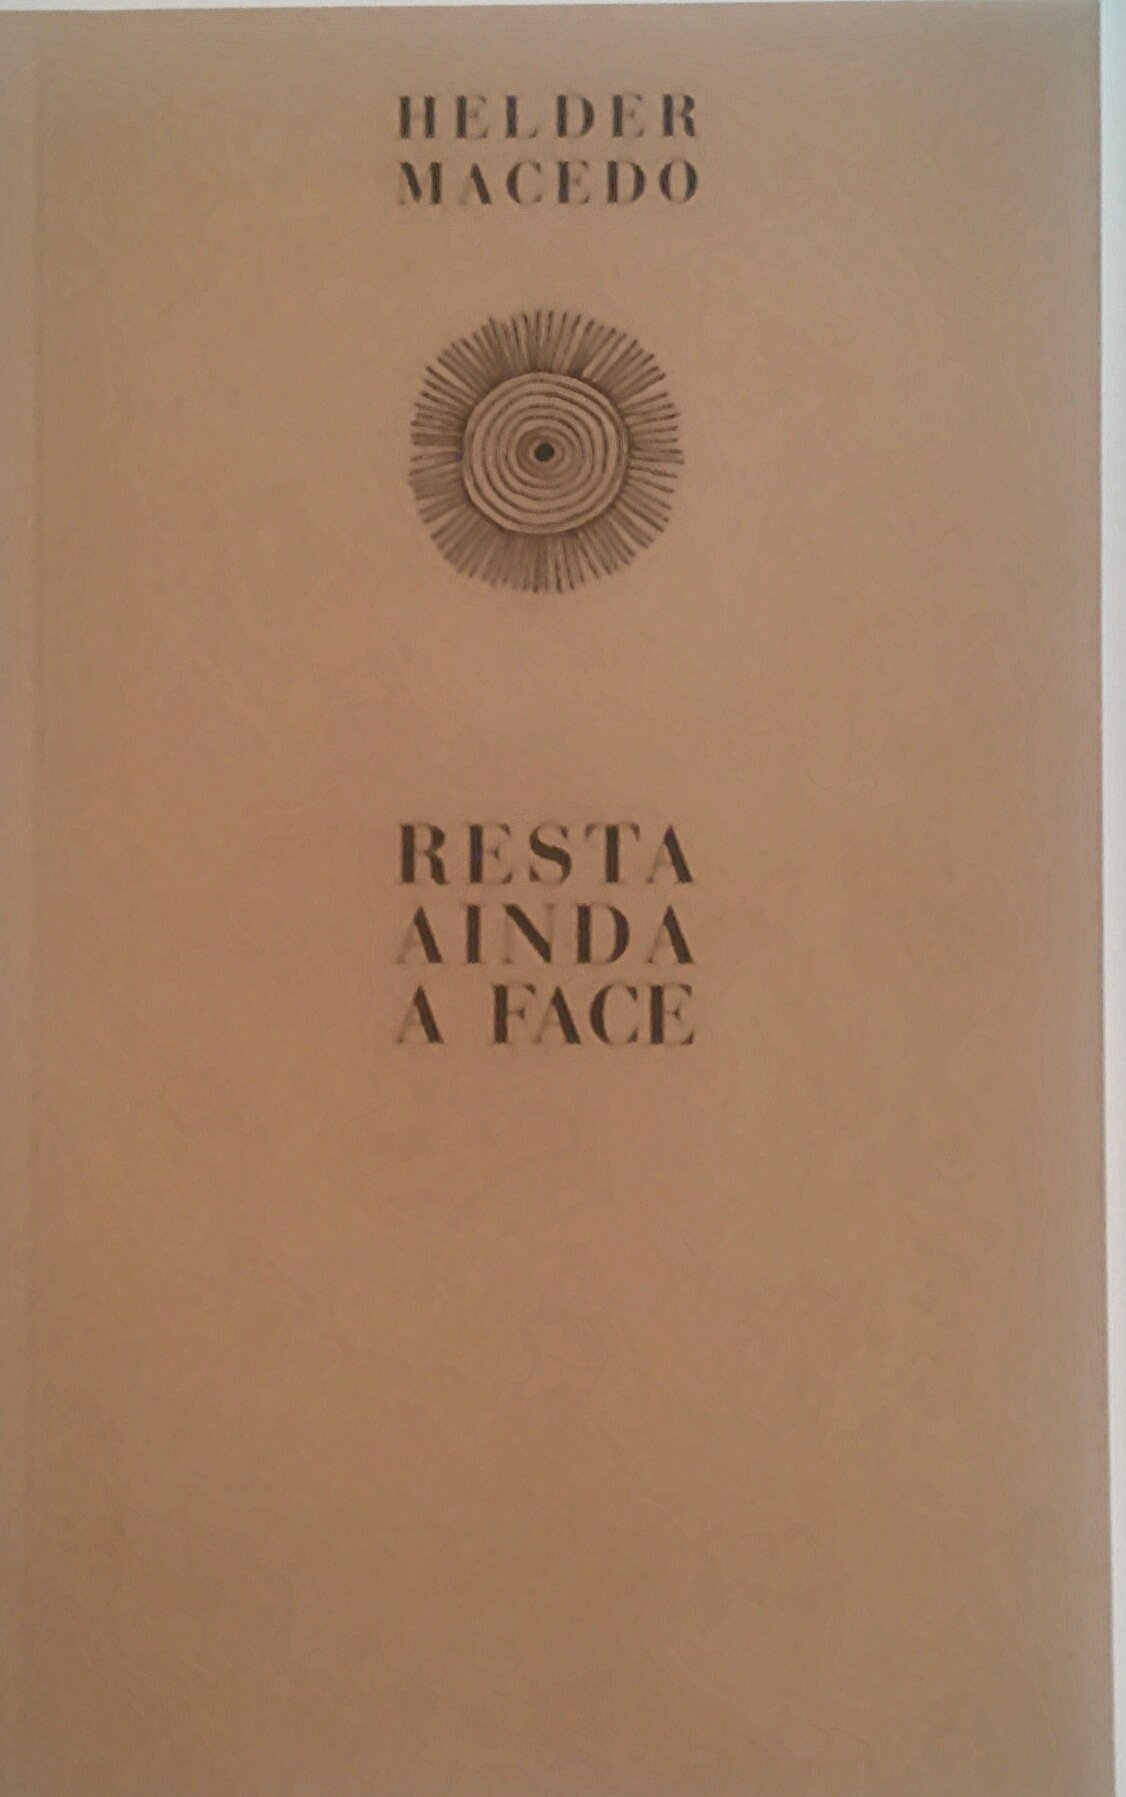 Resta ainda a Face, poemas coligidos e com posfácio de Paulo José Miranda, na Abysmo